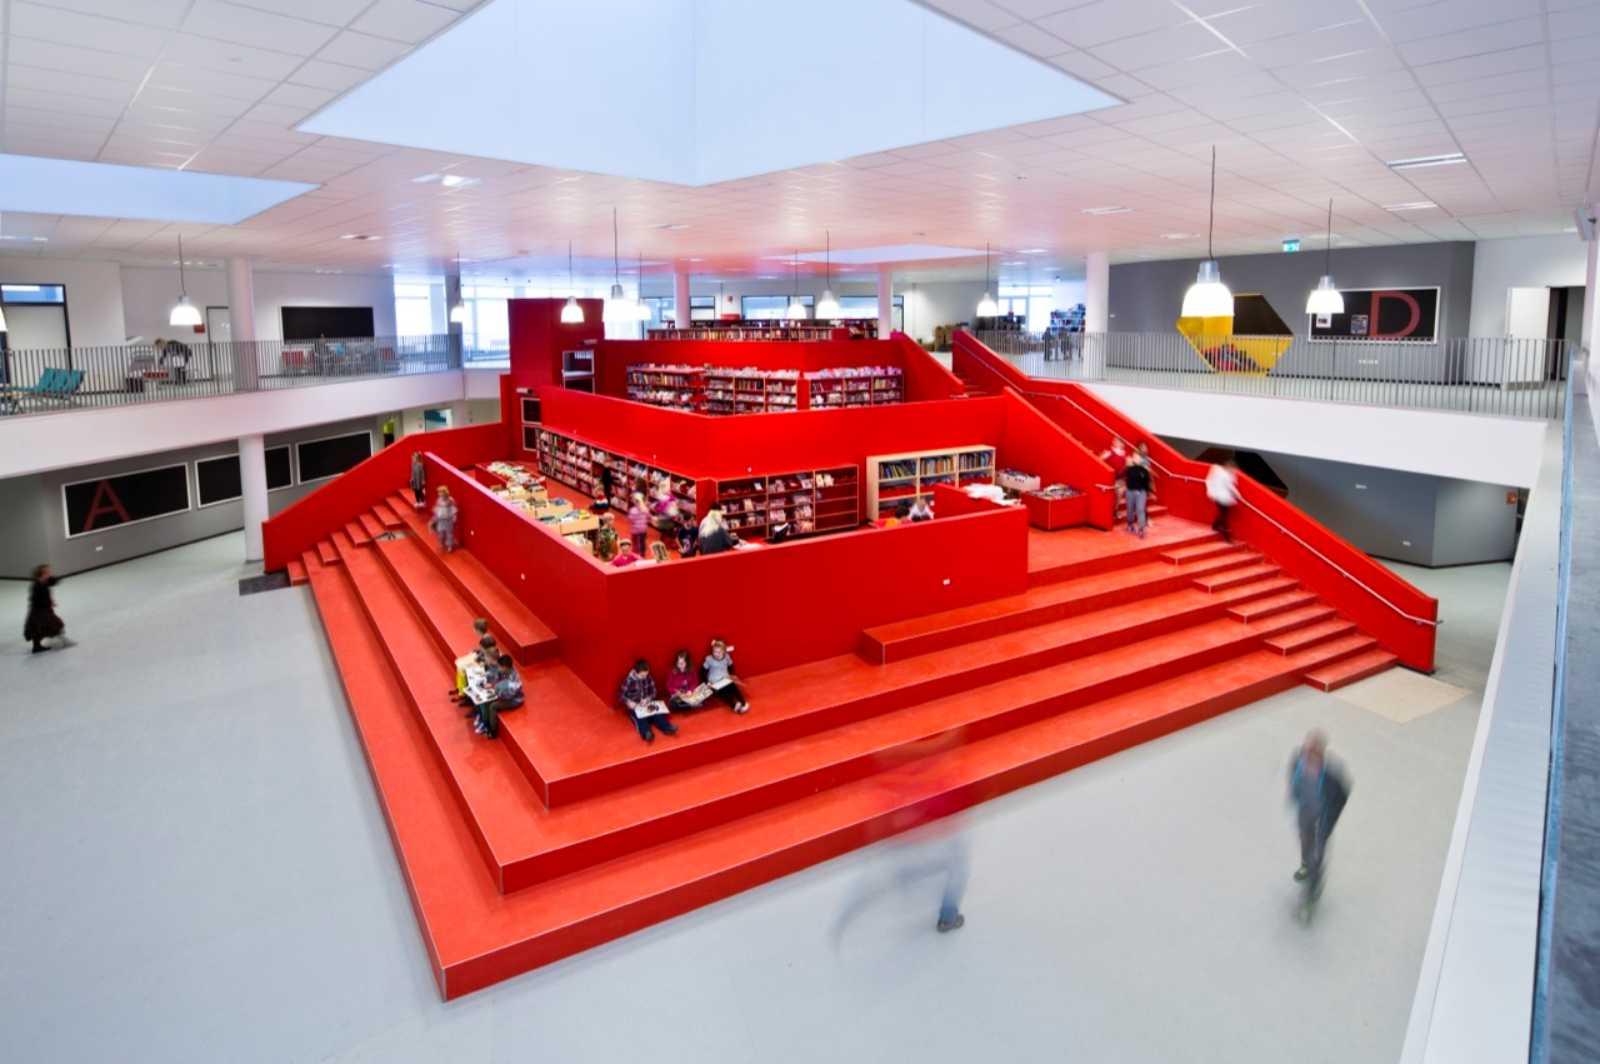 NORTH STAR SCHOOL BY ARKITEMA ARCHITECTS